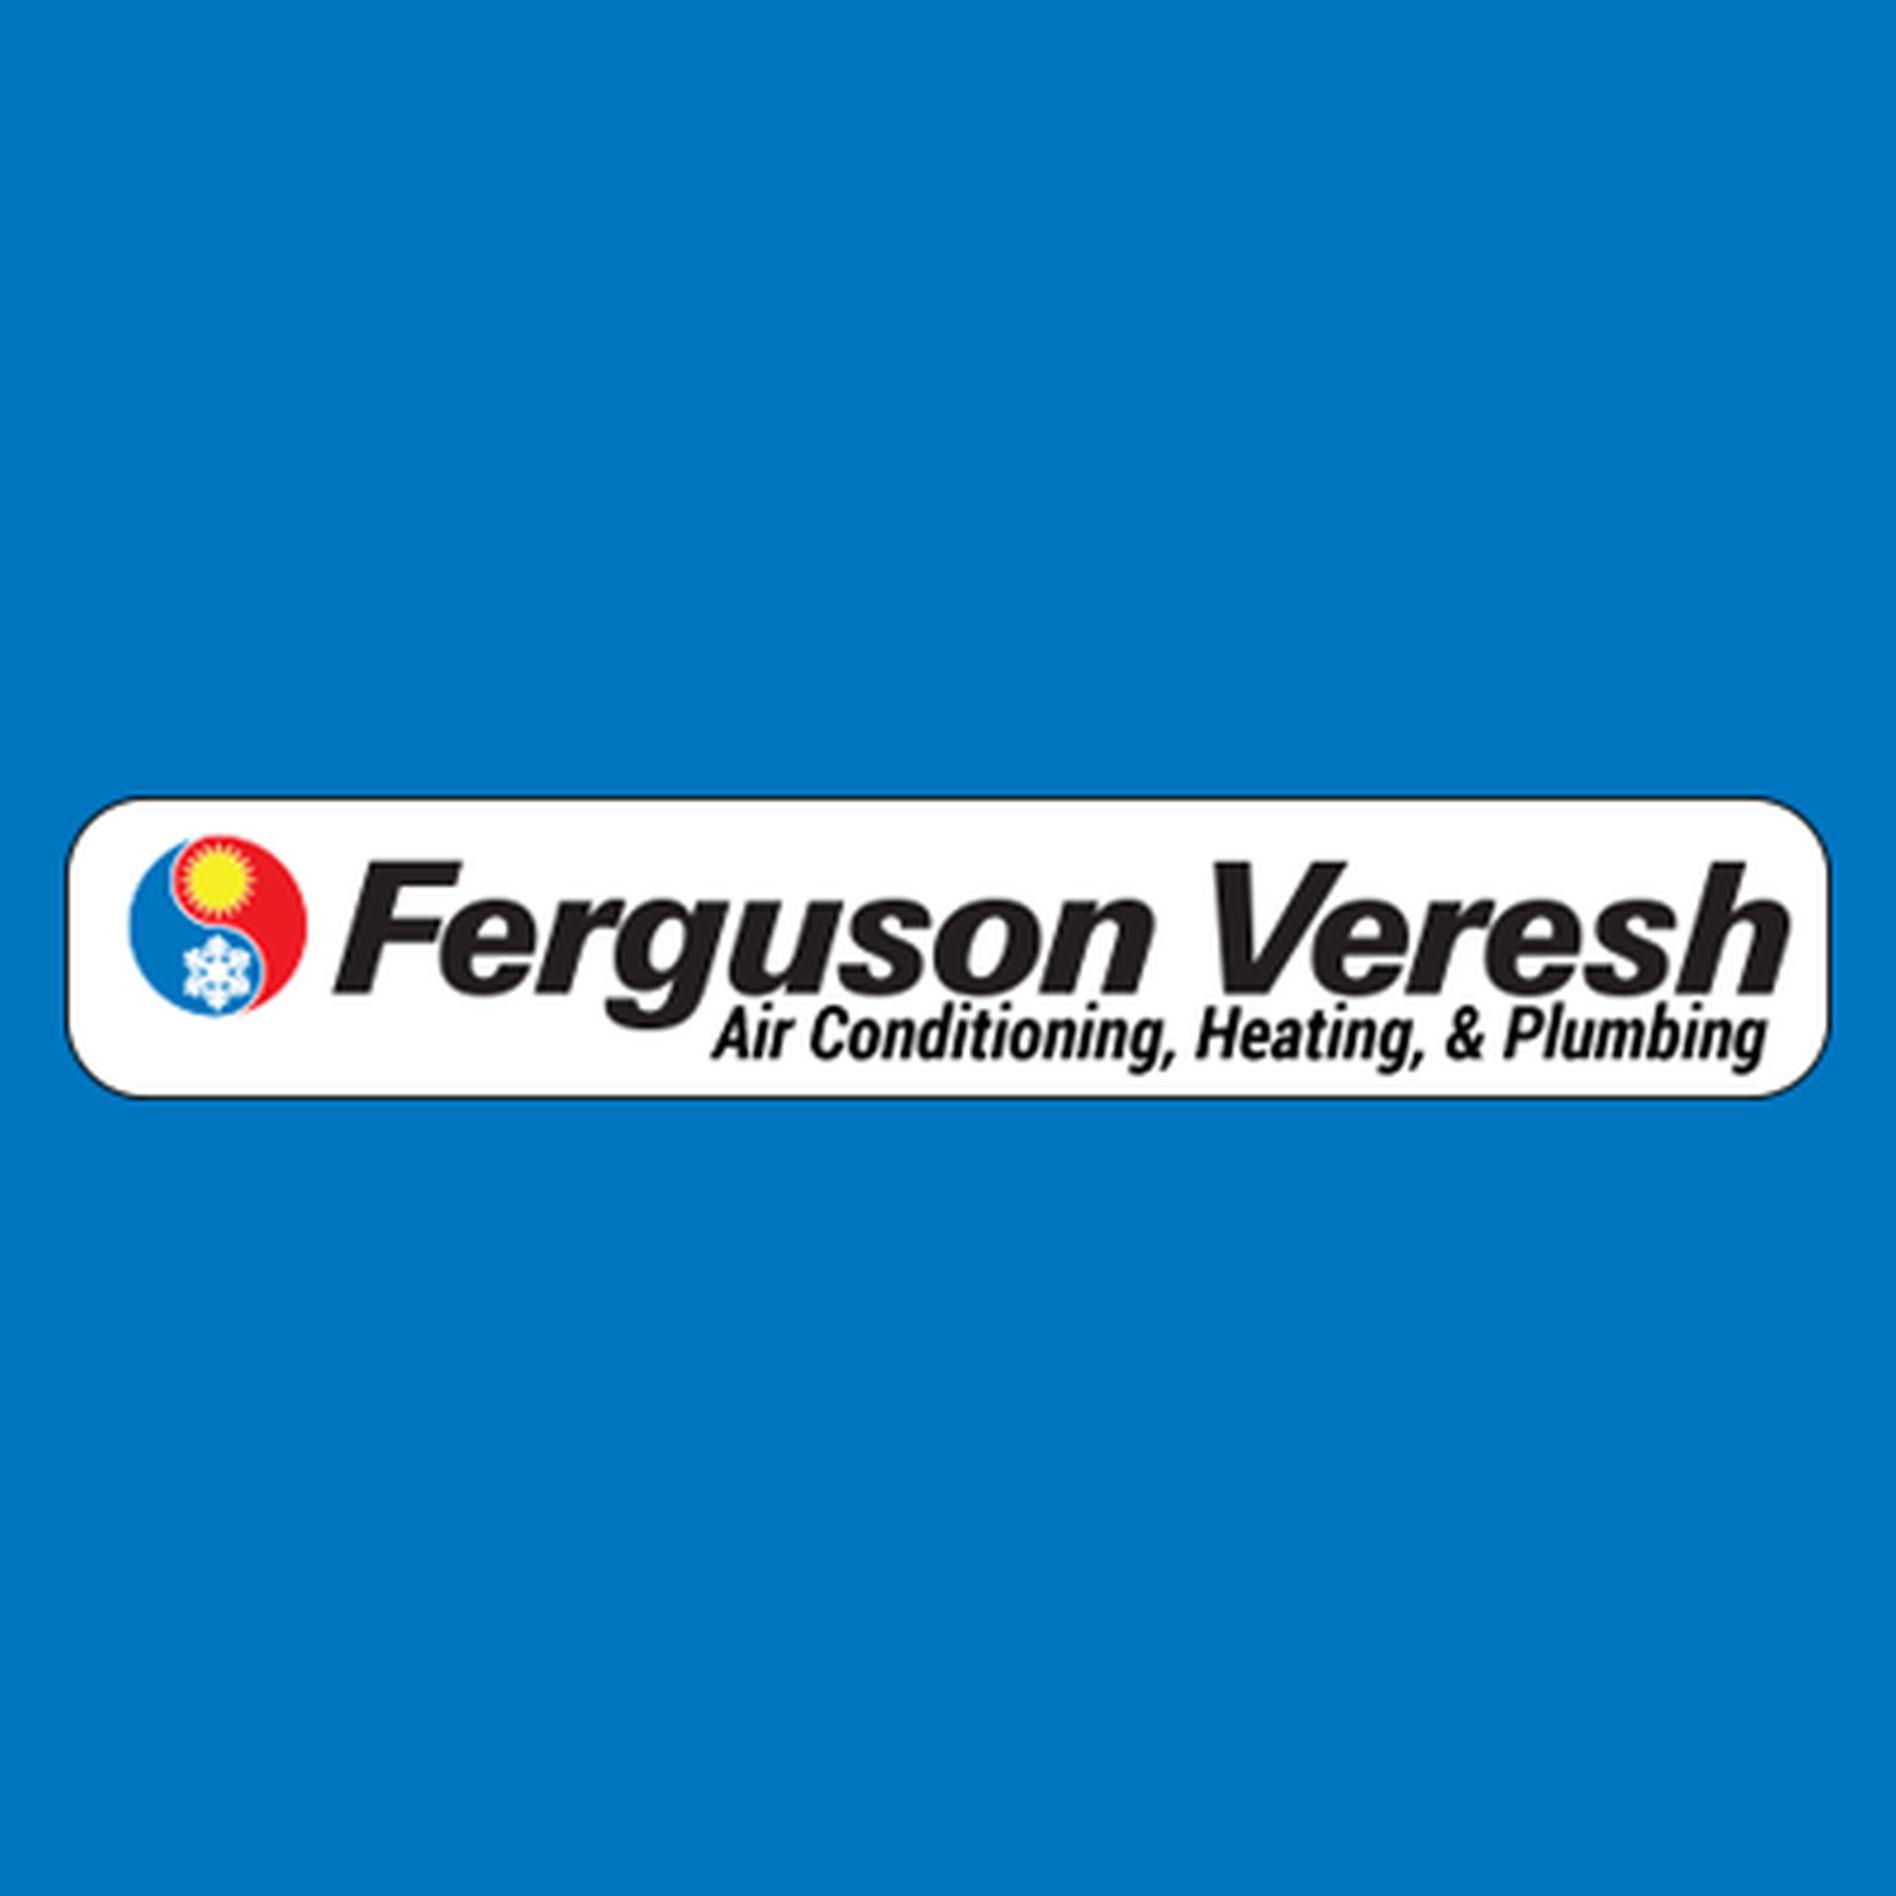 denver and aurora supplying co ferguson small program water residential heater plumbing waterheaters branch online